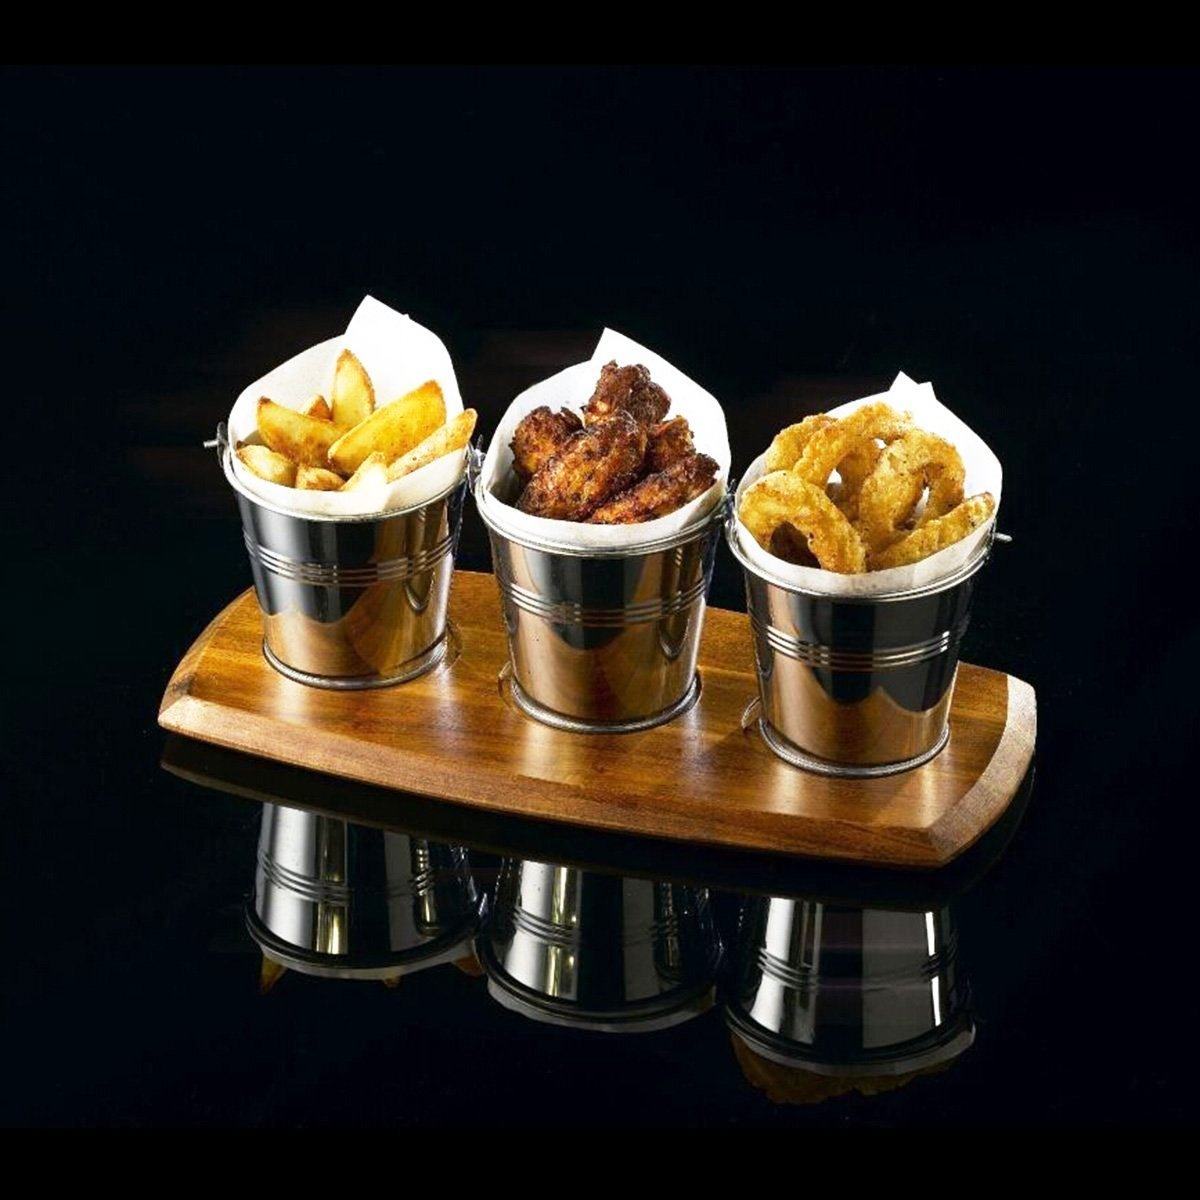 OUNONA Mini Metal Bucket Set of 6 /Mini Food Containers/Succulent Wedding Buckets 10.5x7.2x10.5cm by OUNONA (Image #7)